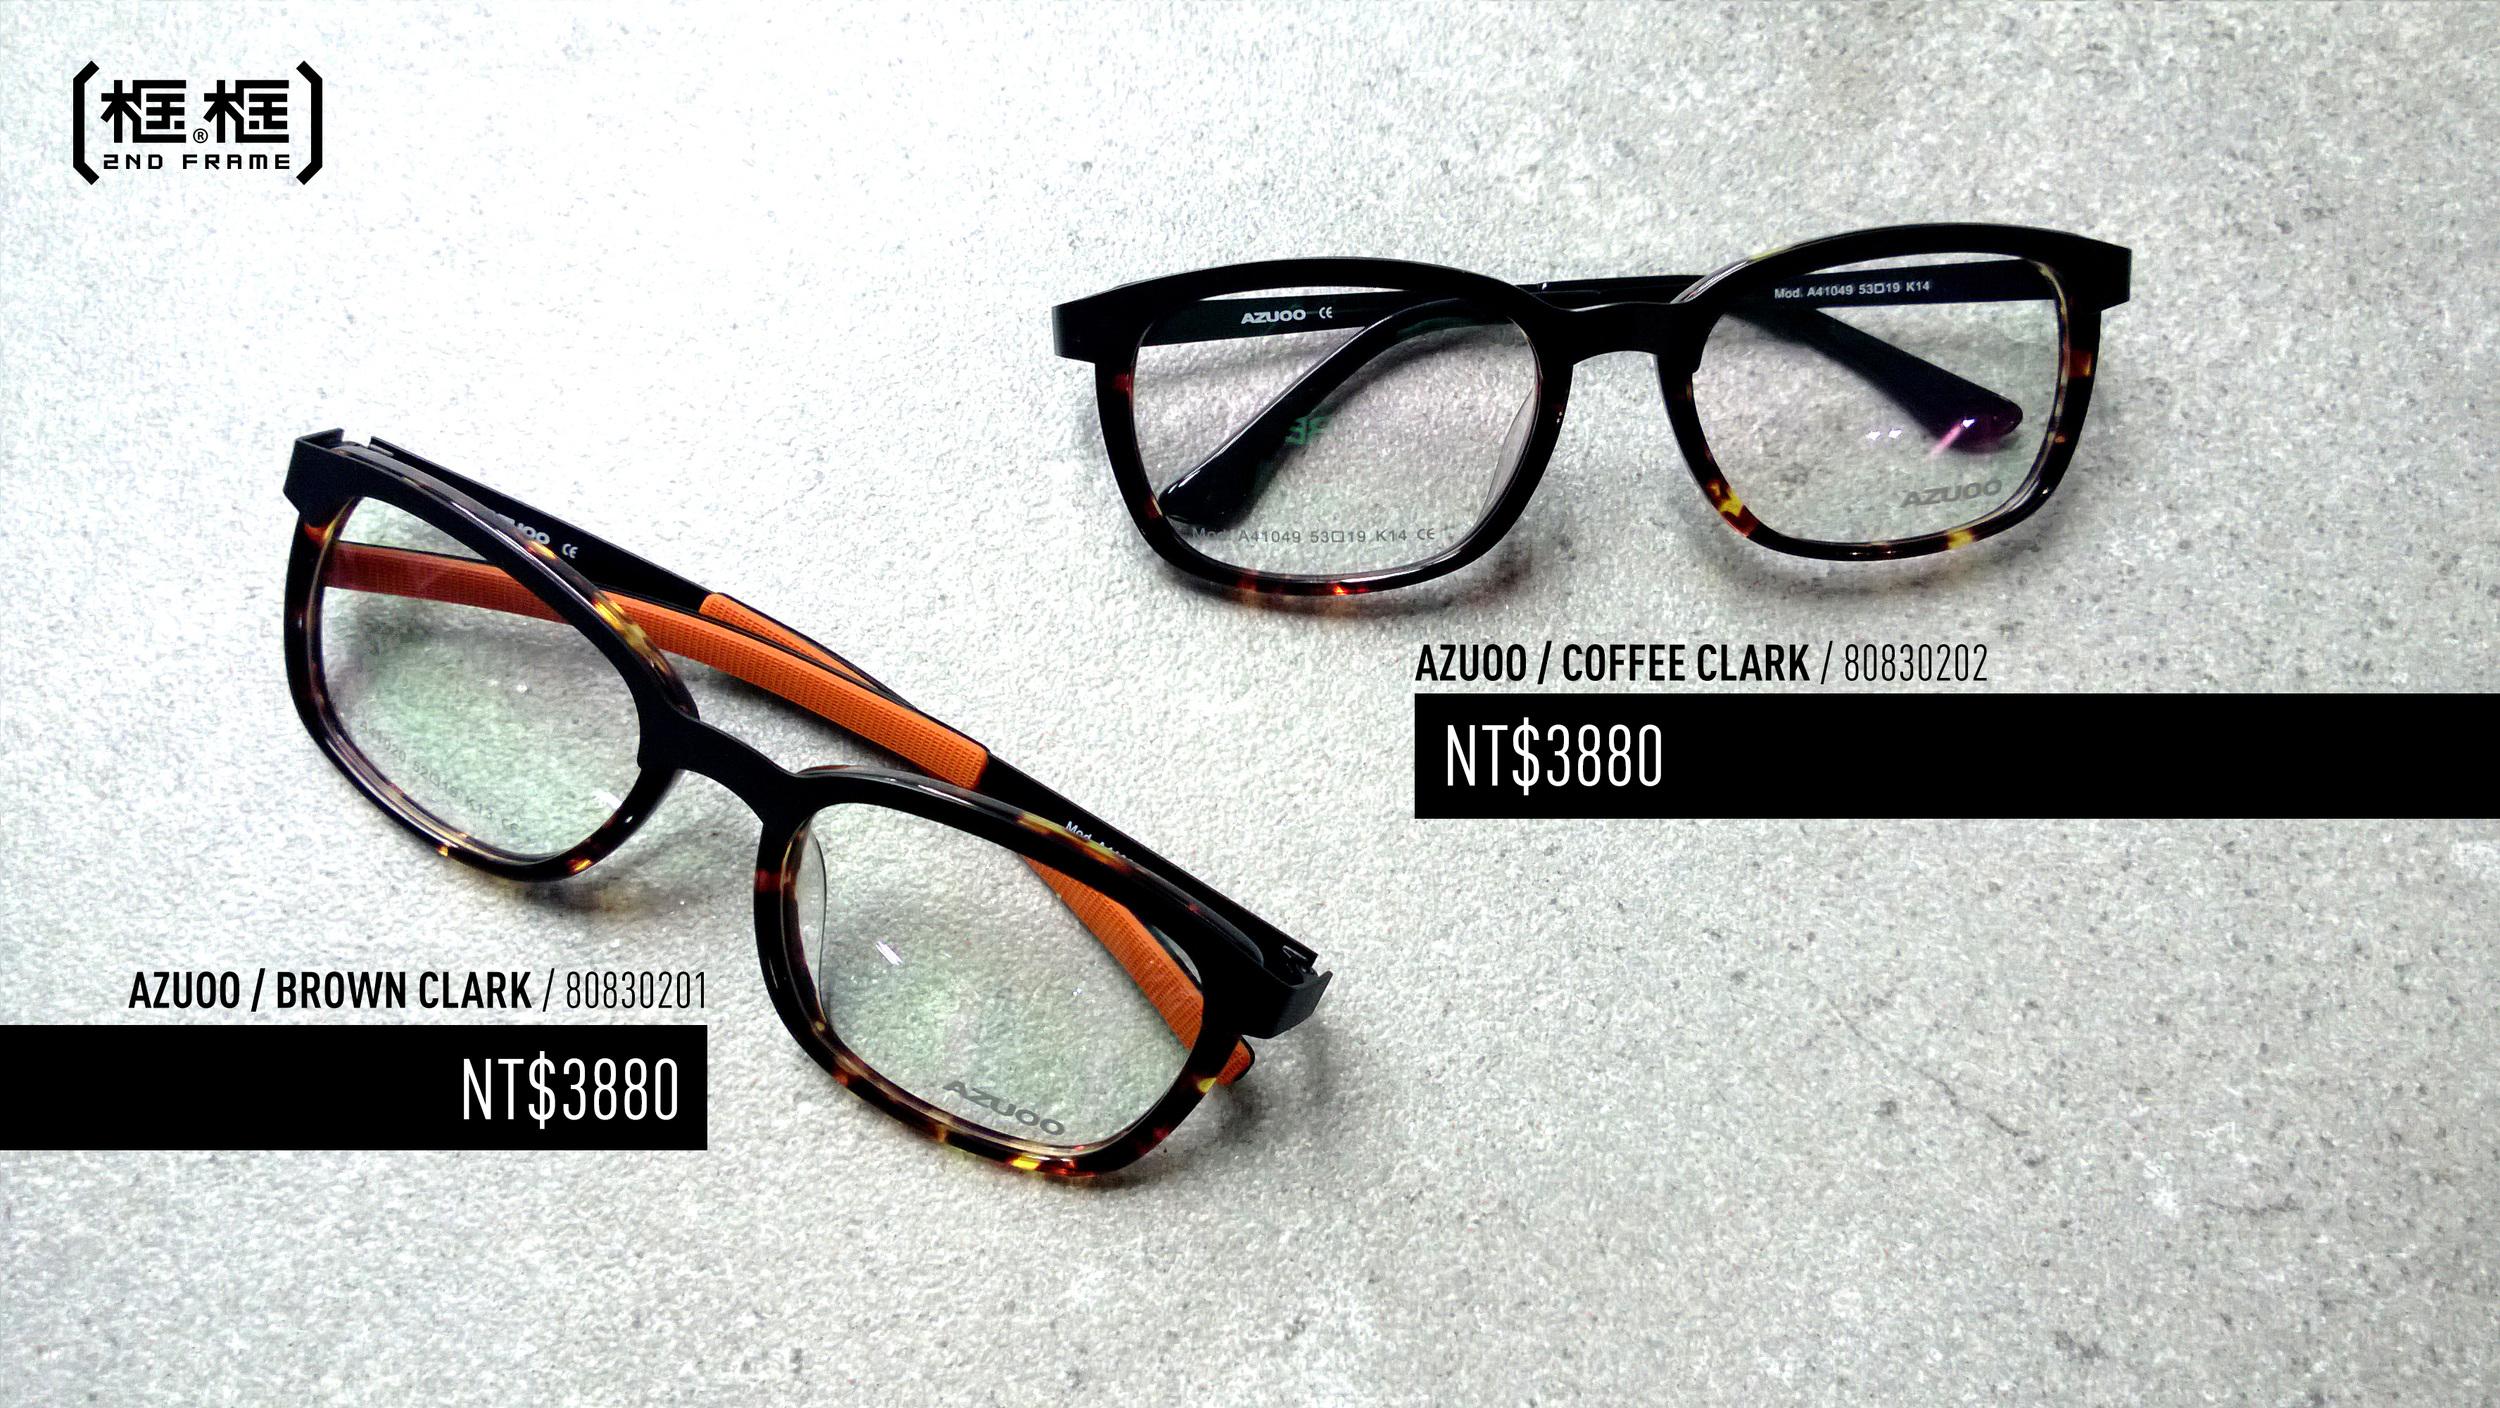 COFFEE CLARK / BROWN CLARK